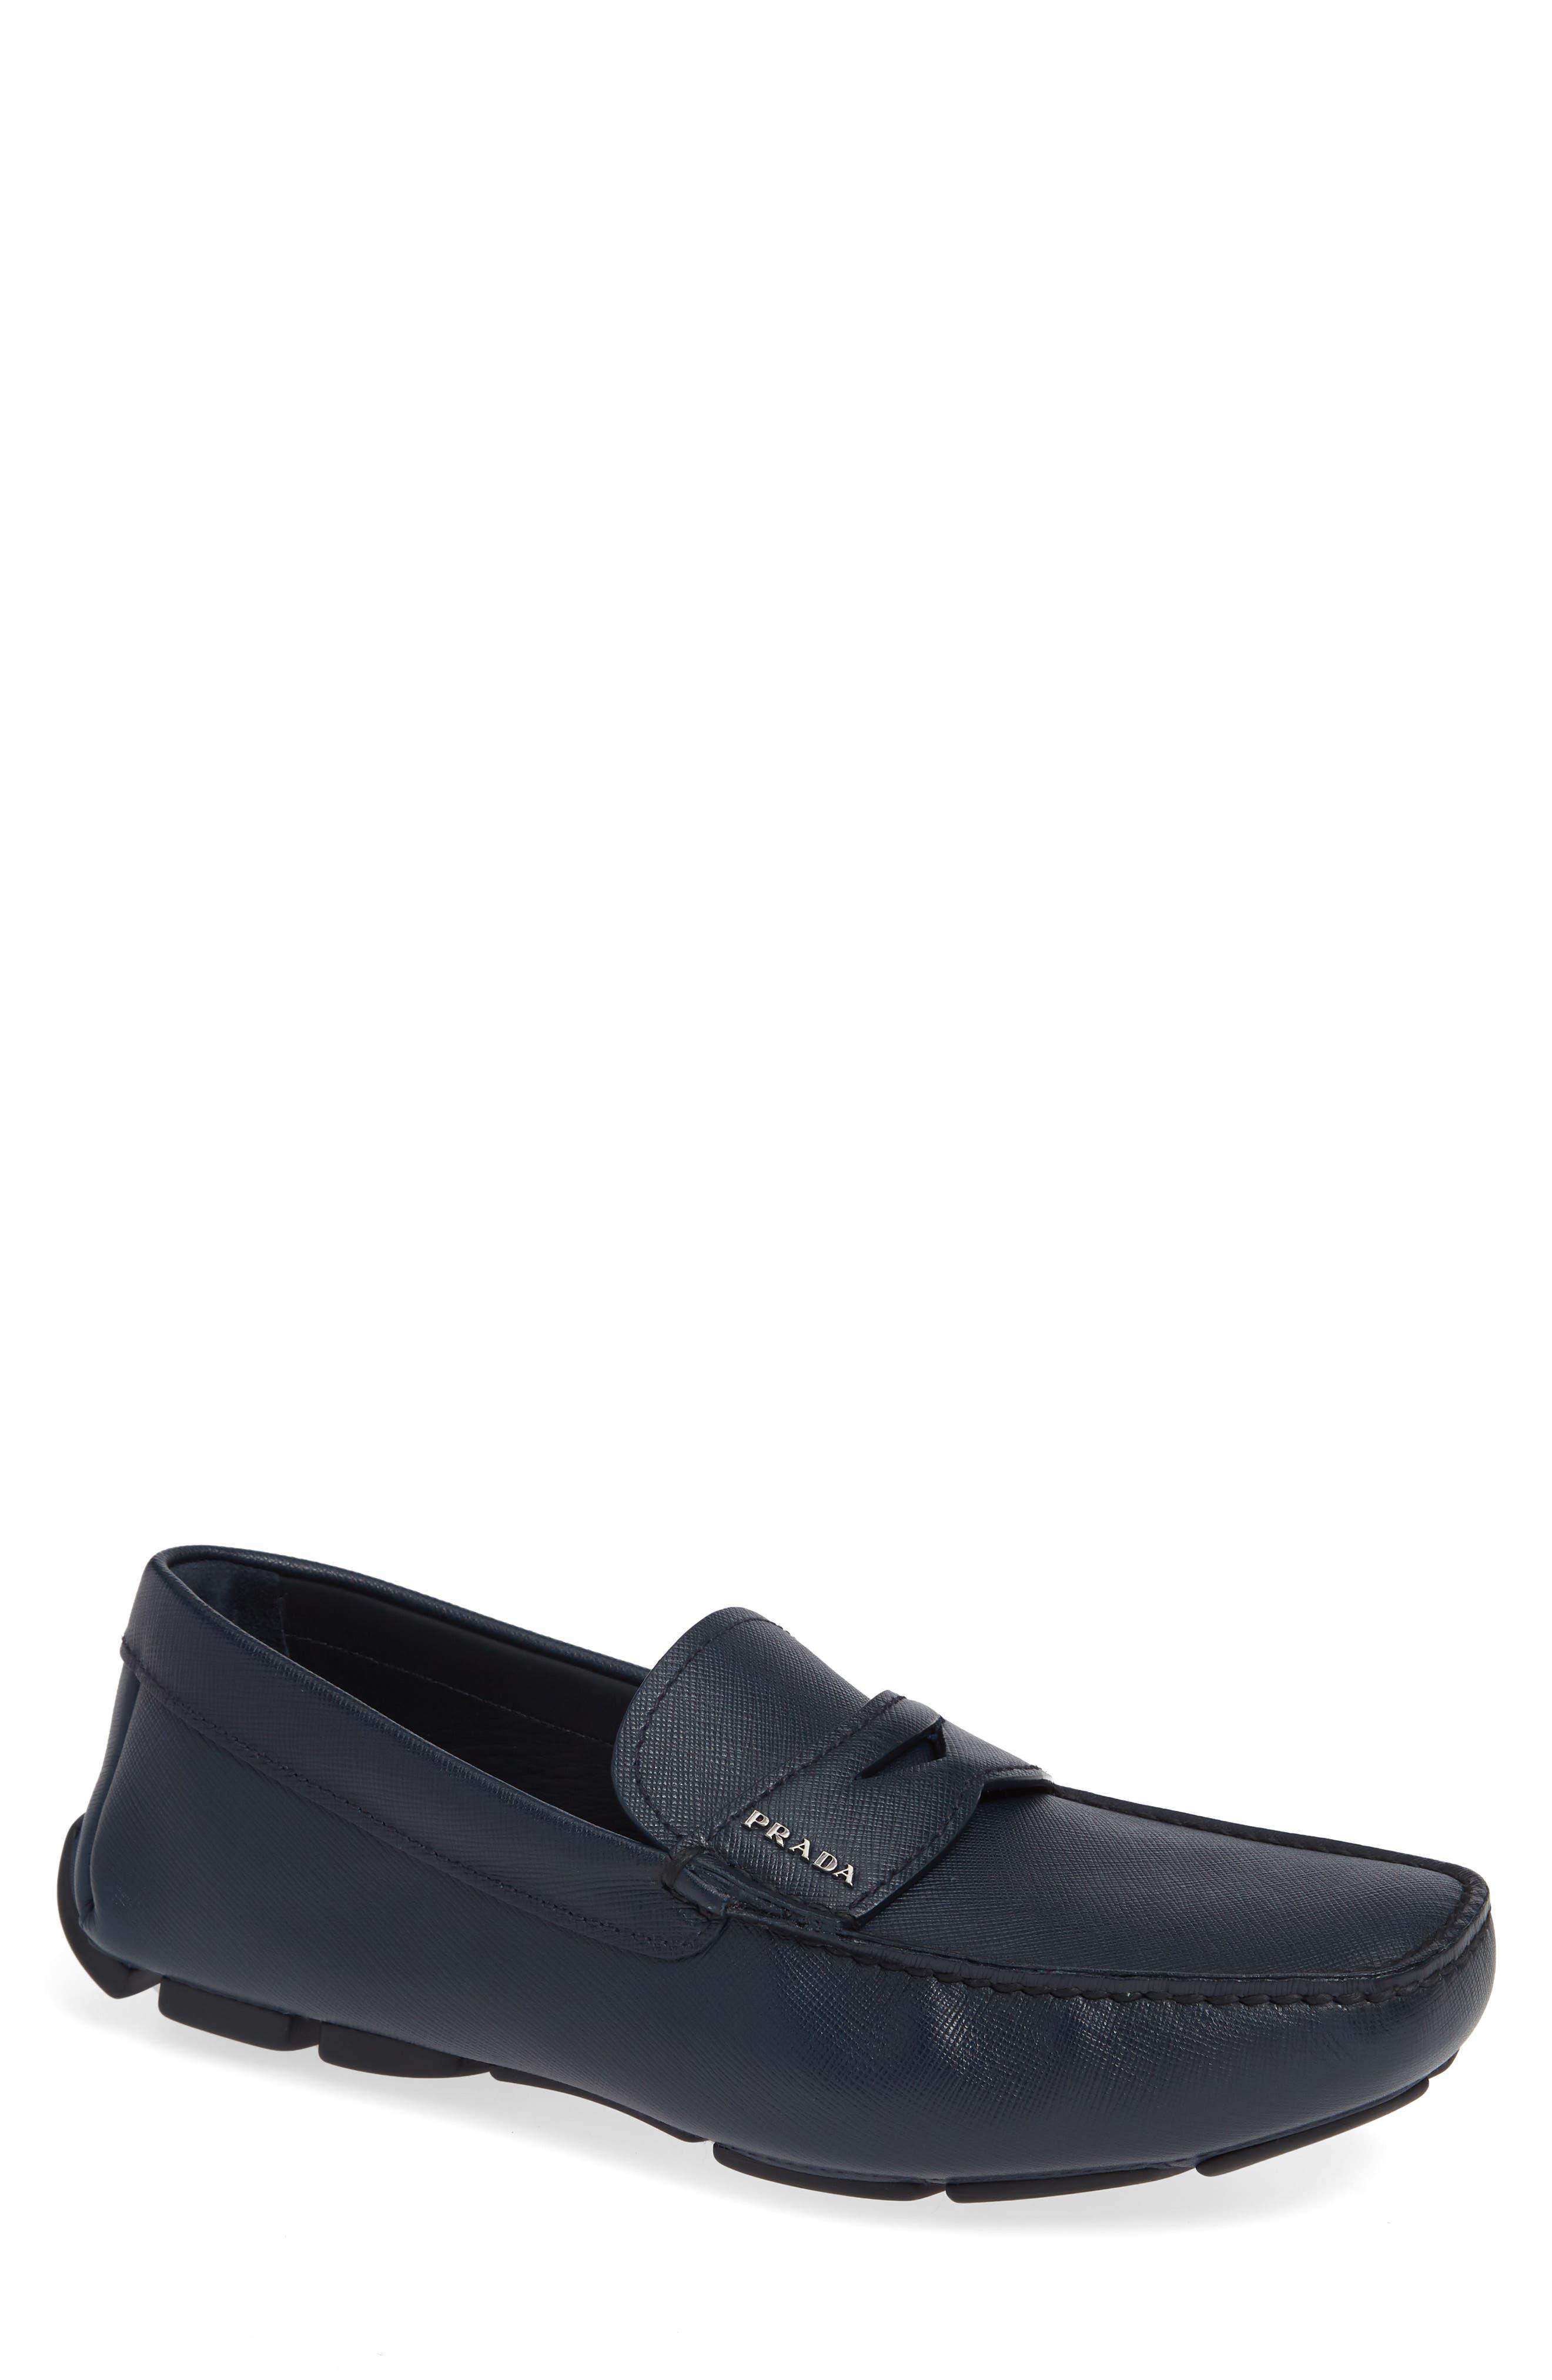 Driving Shoe,                         Main,                         color, Baltico Blue